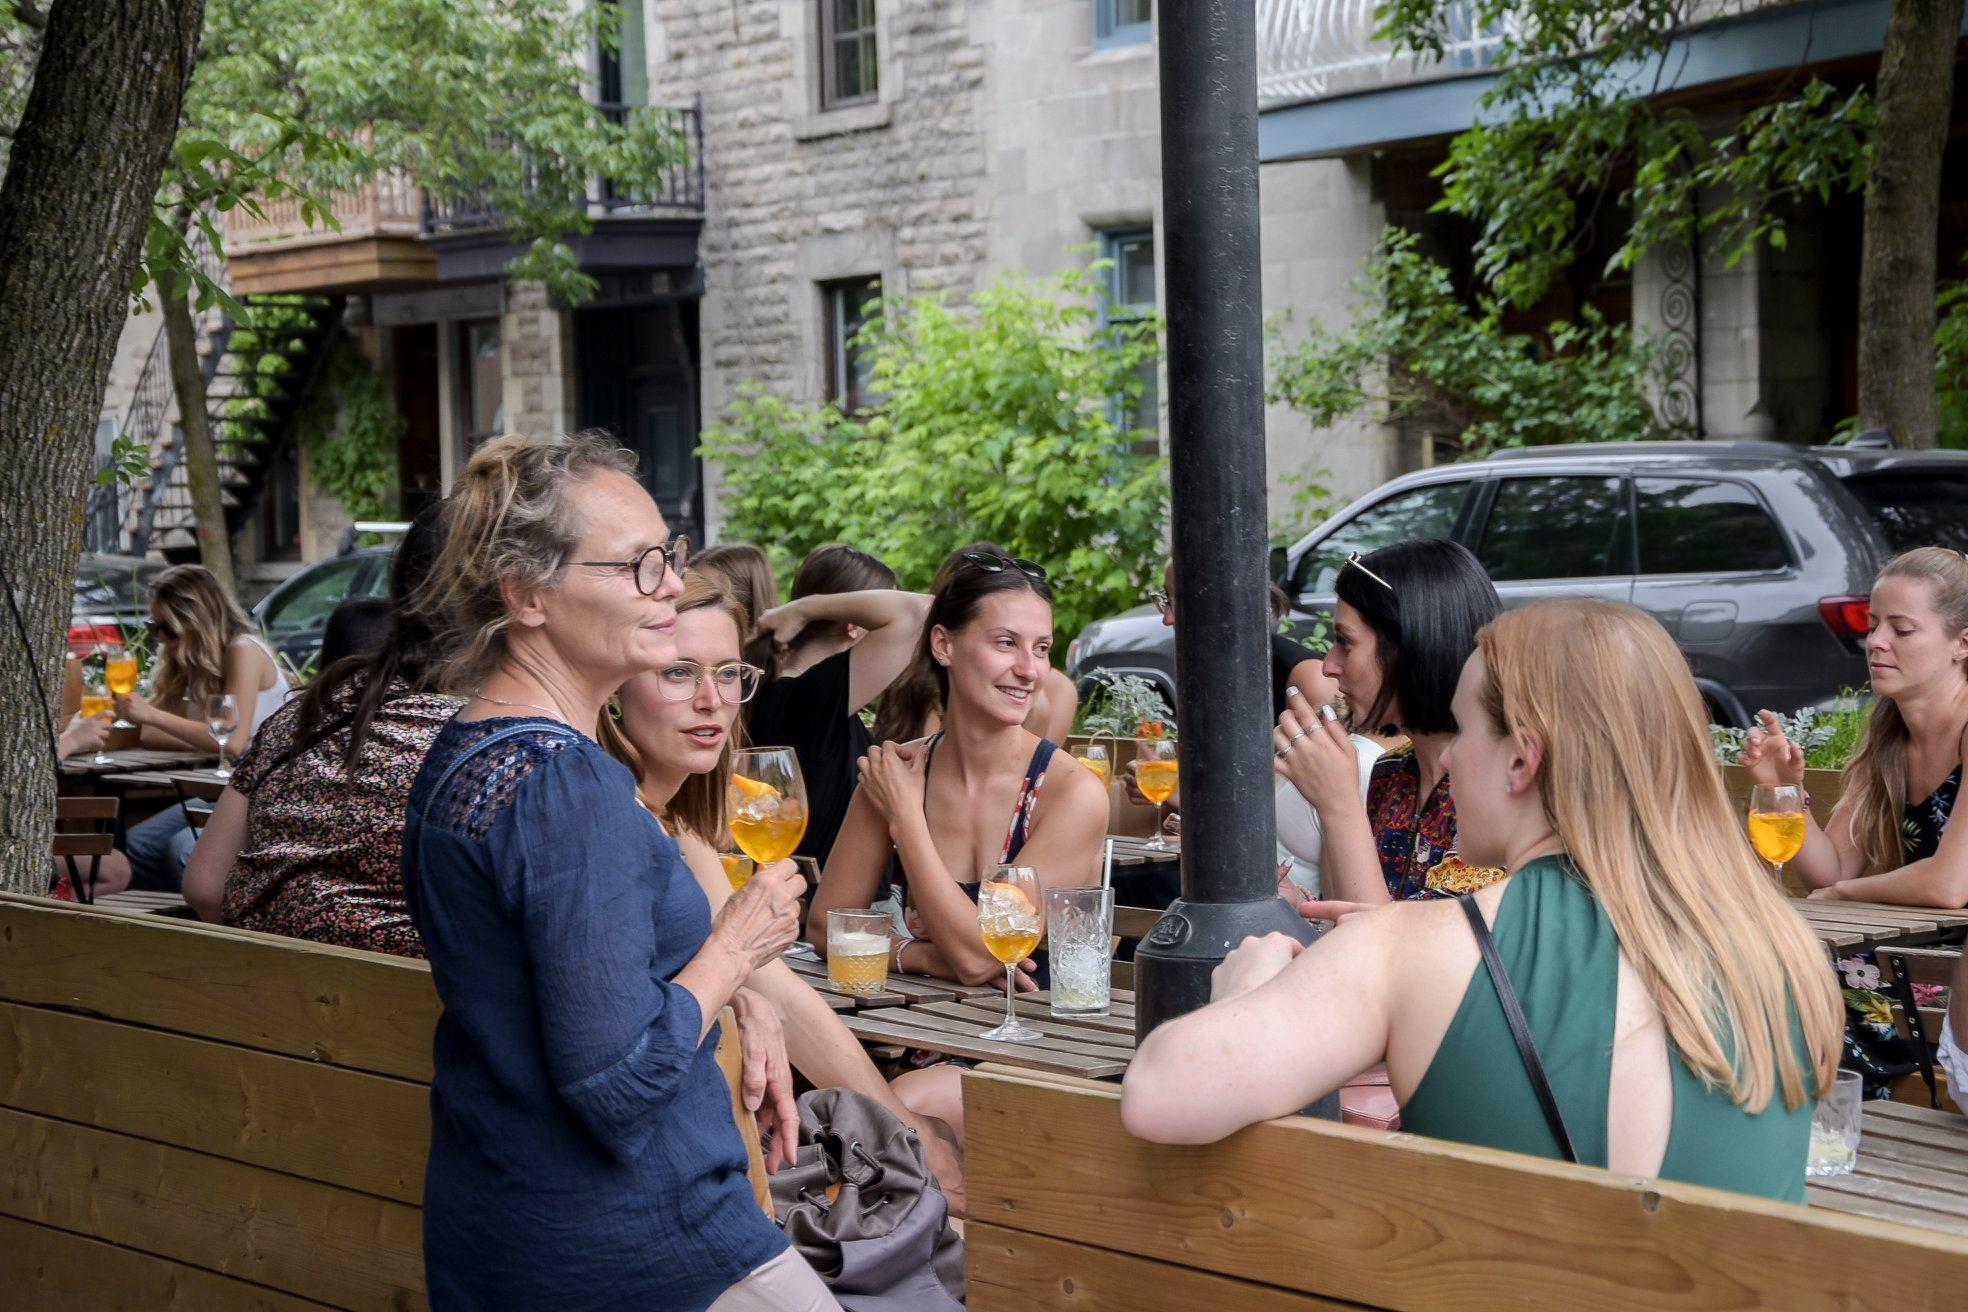 party 6 ans le cahier mtl bar terrasse